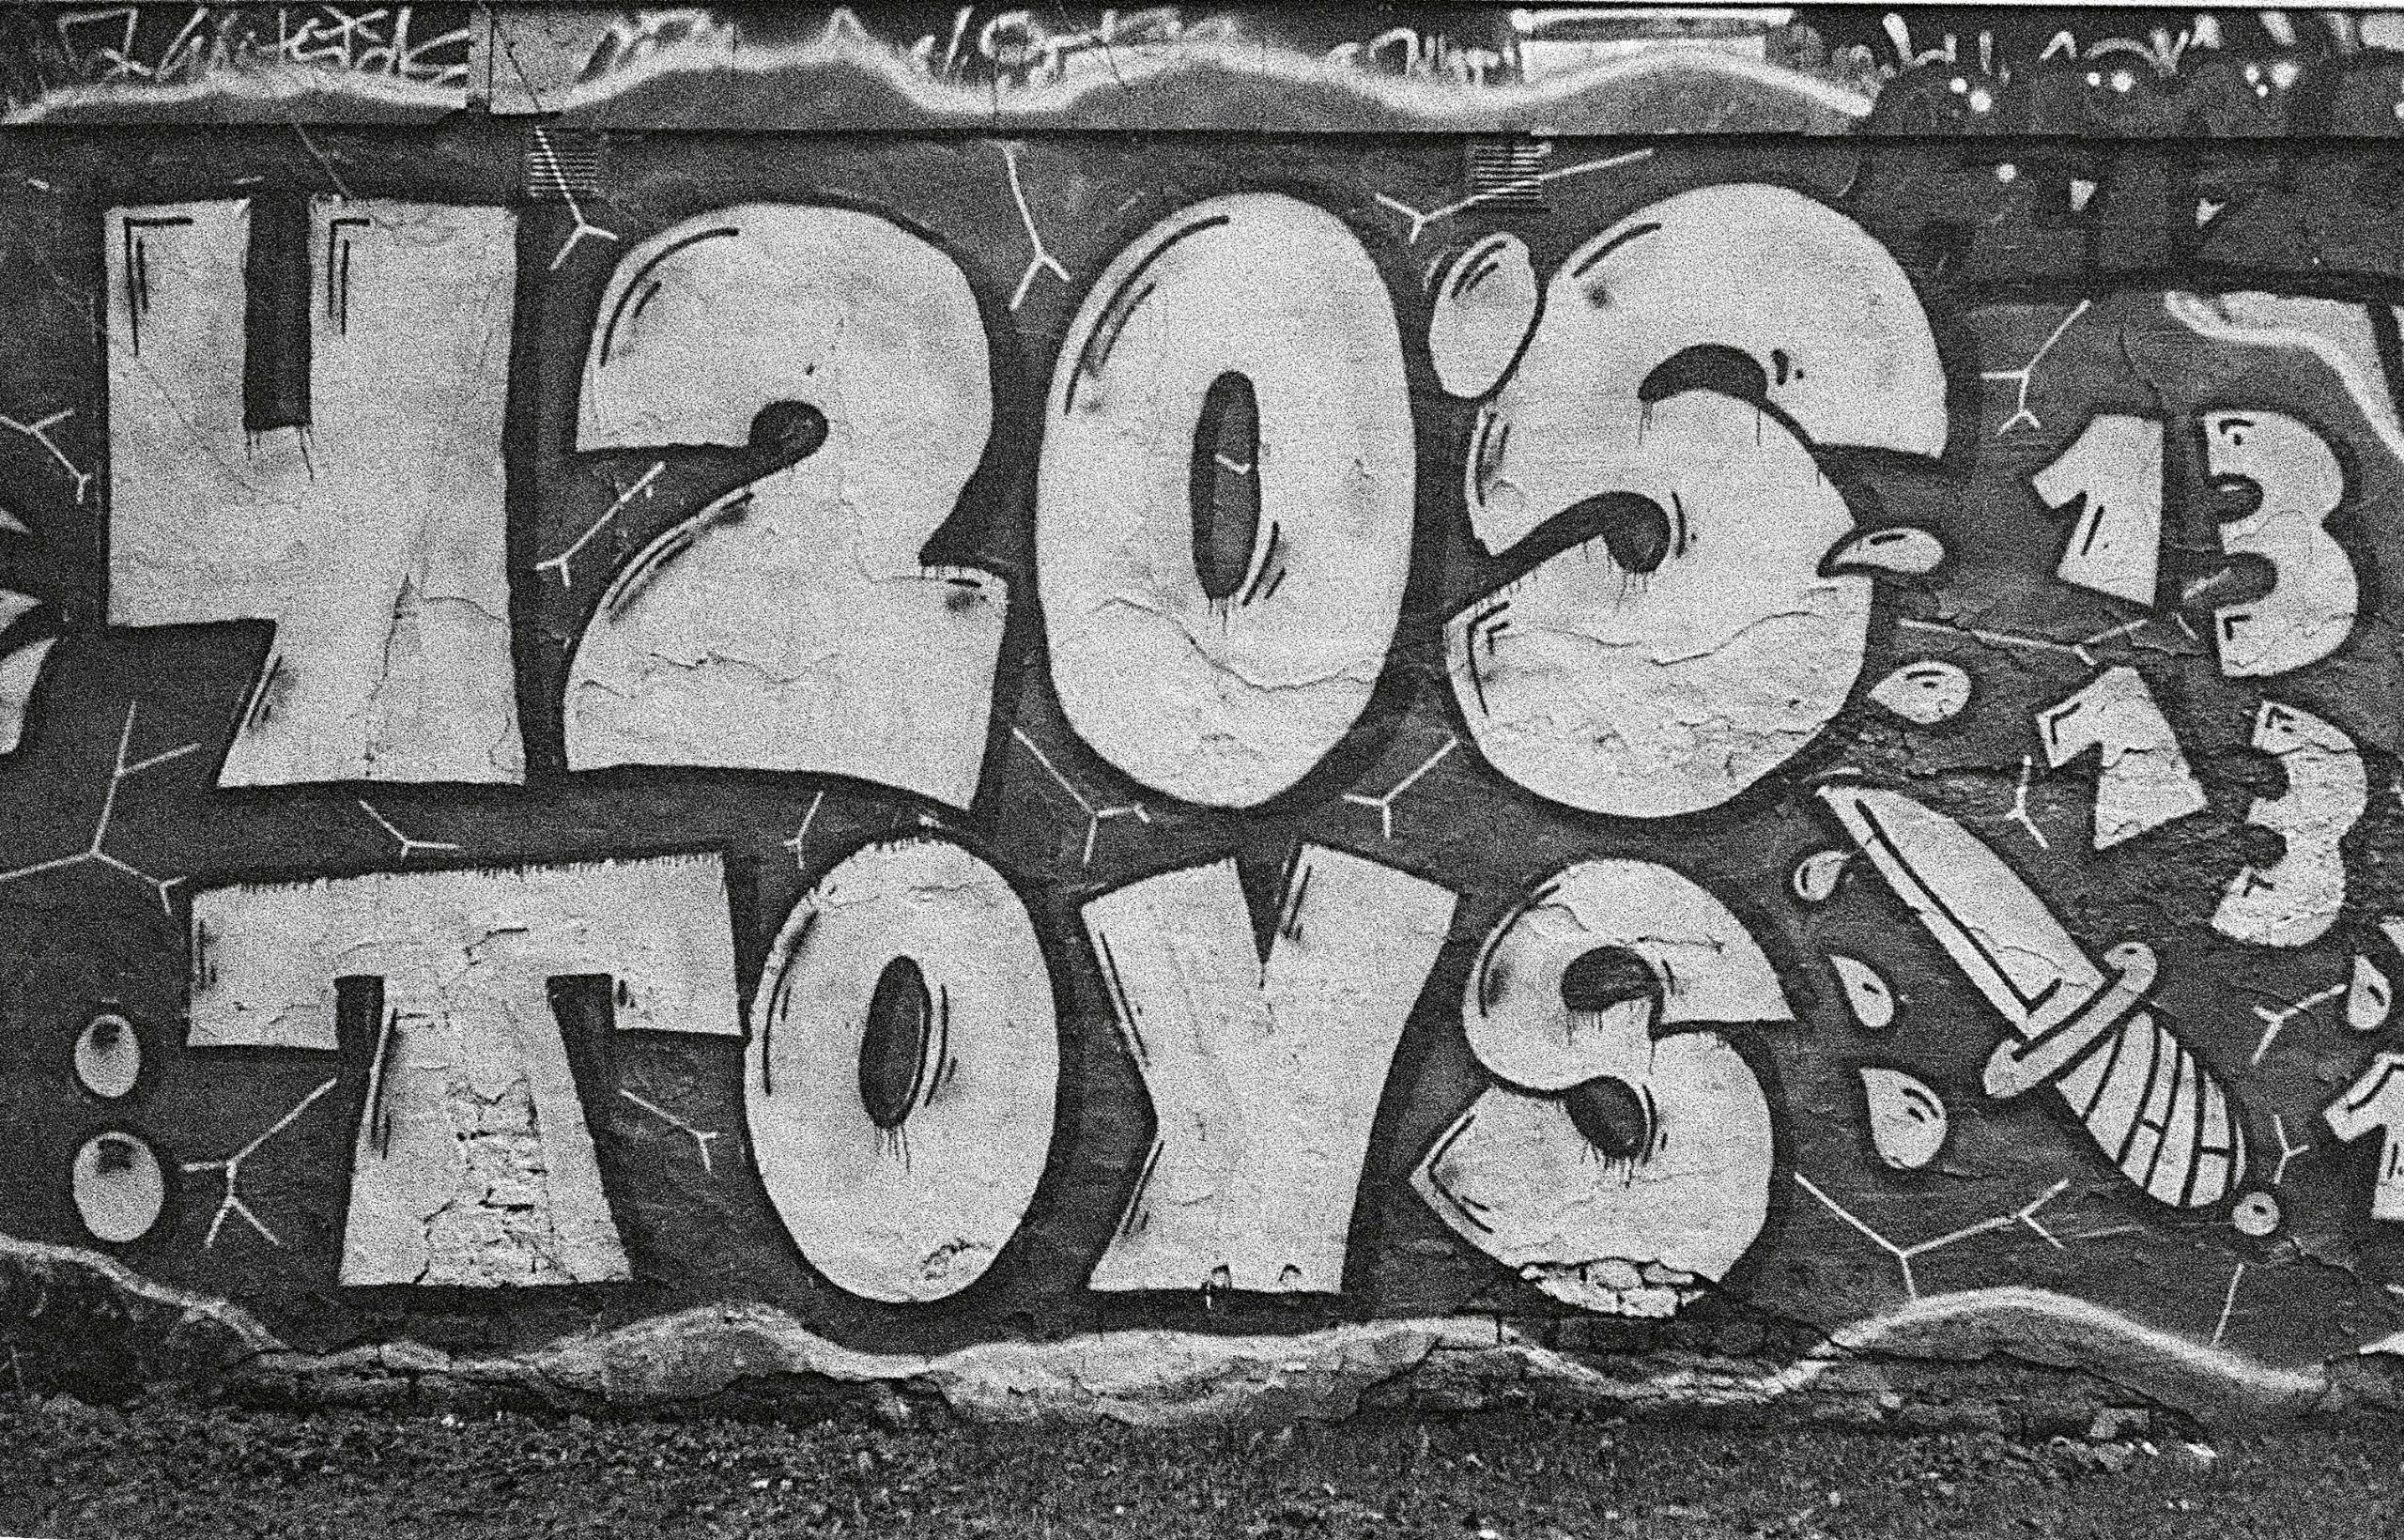 Toys Camera: PENTAX smc 1:1.7/5 - walter_ac | ello